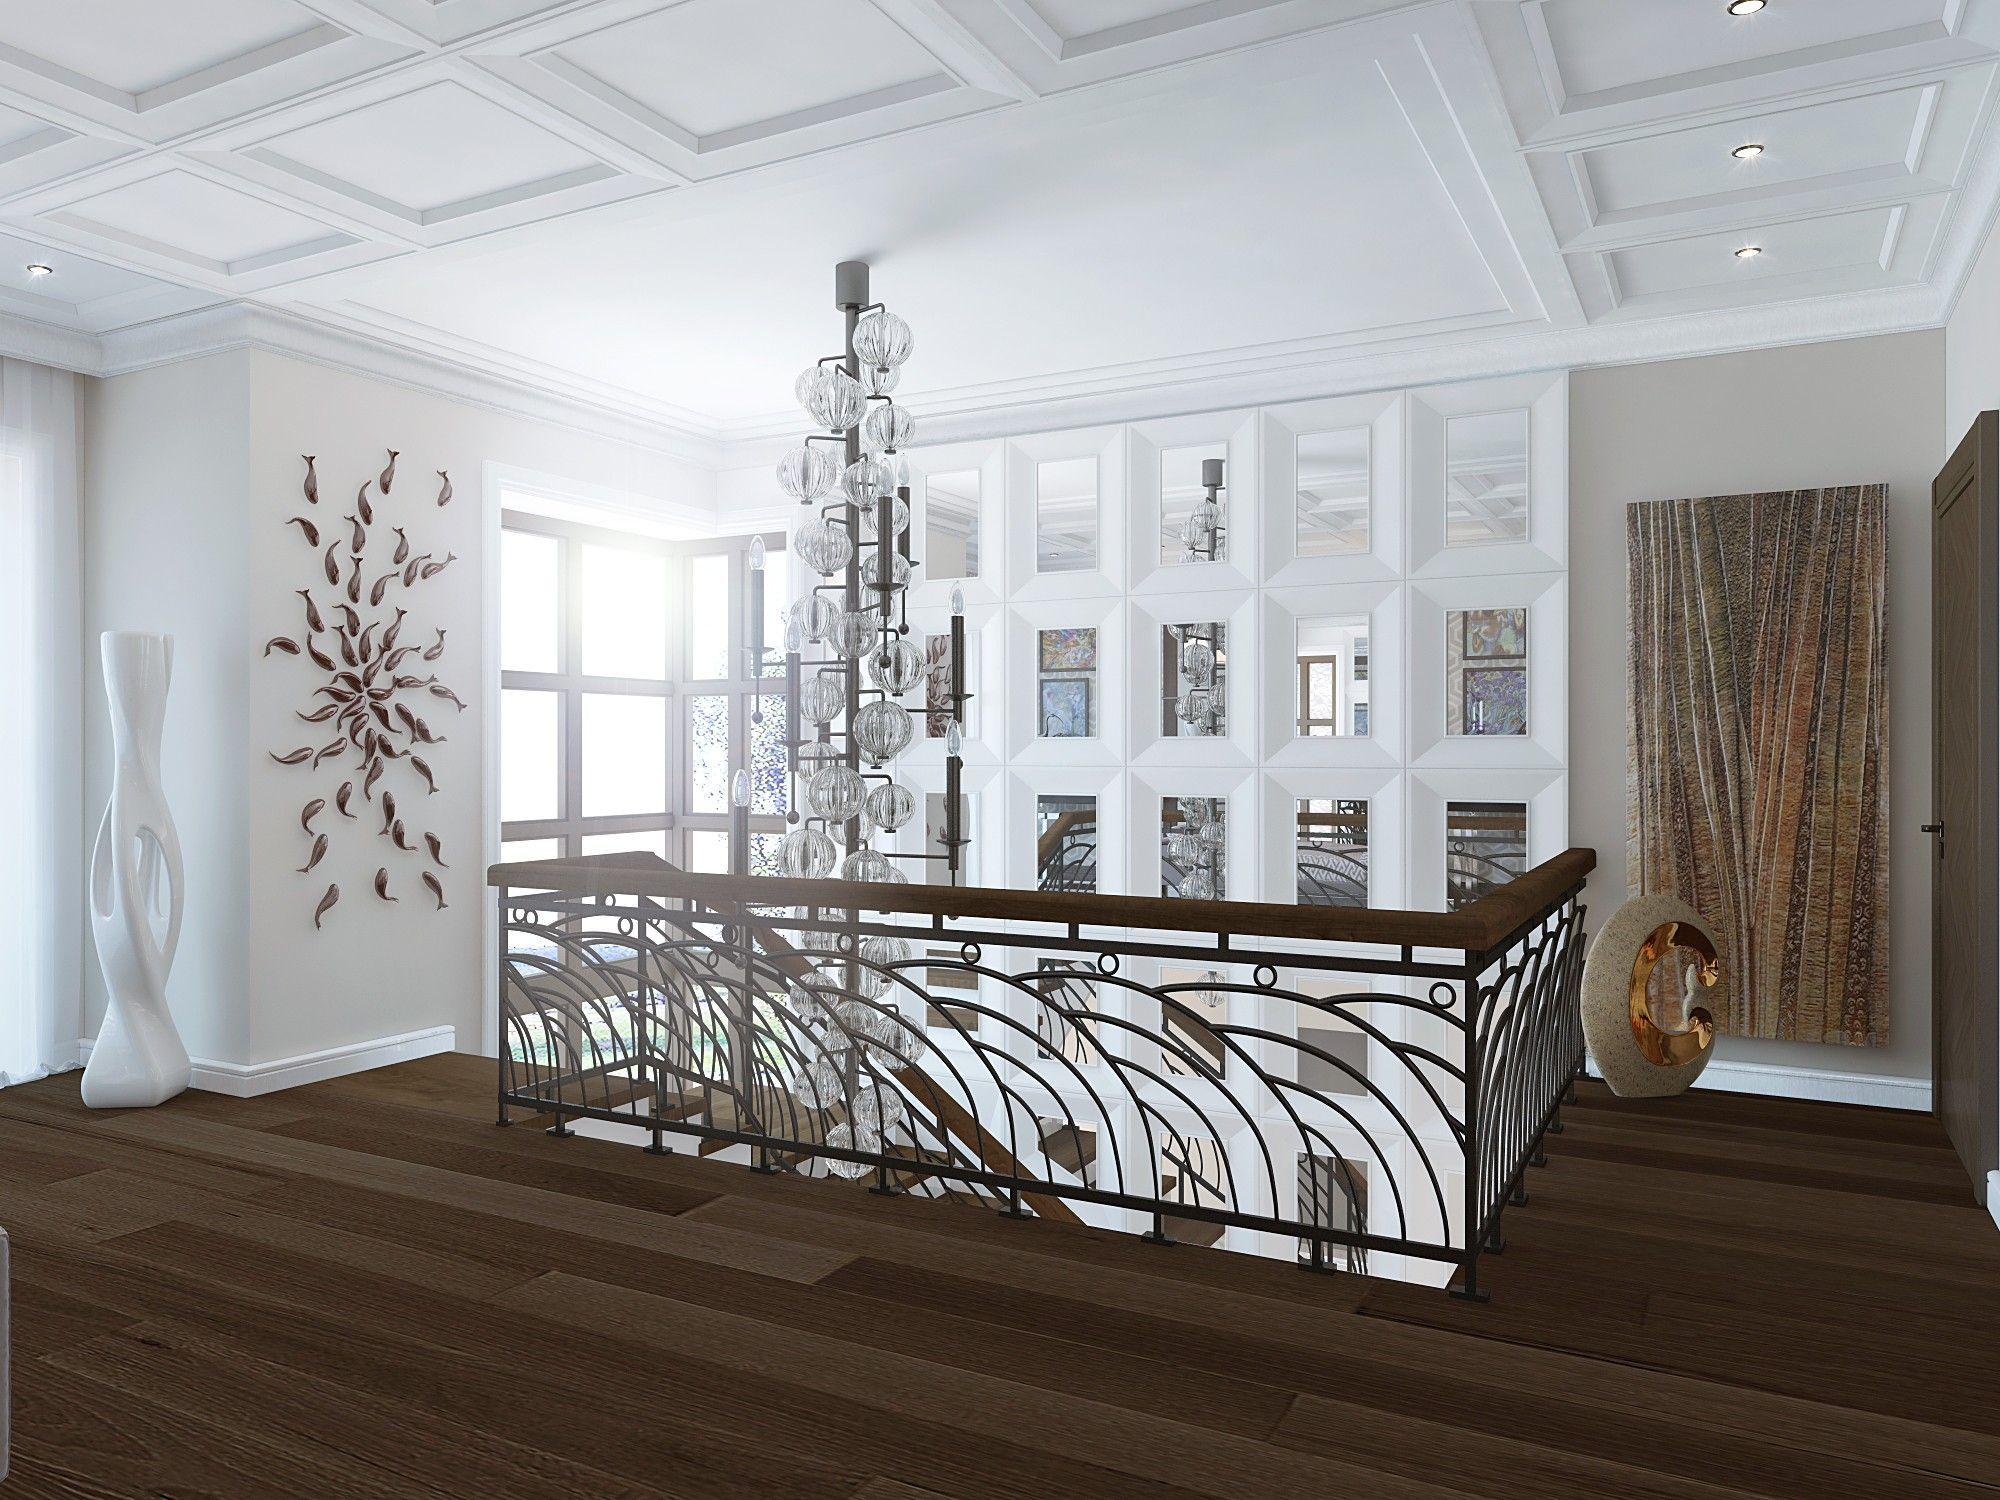 Холл 2-го этажа. Дизайн интерьера дома.